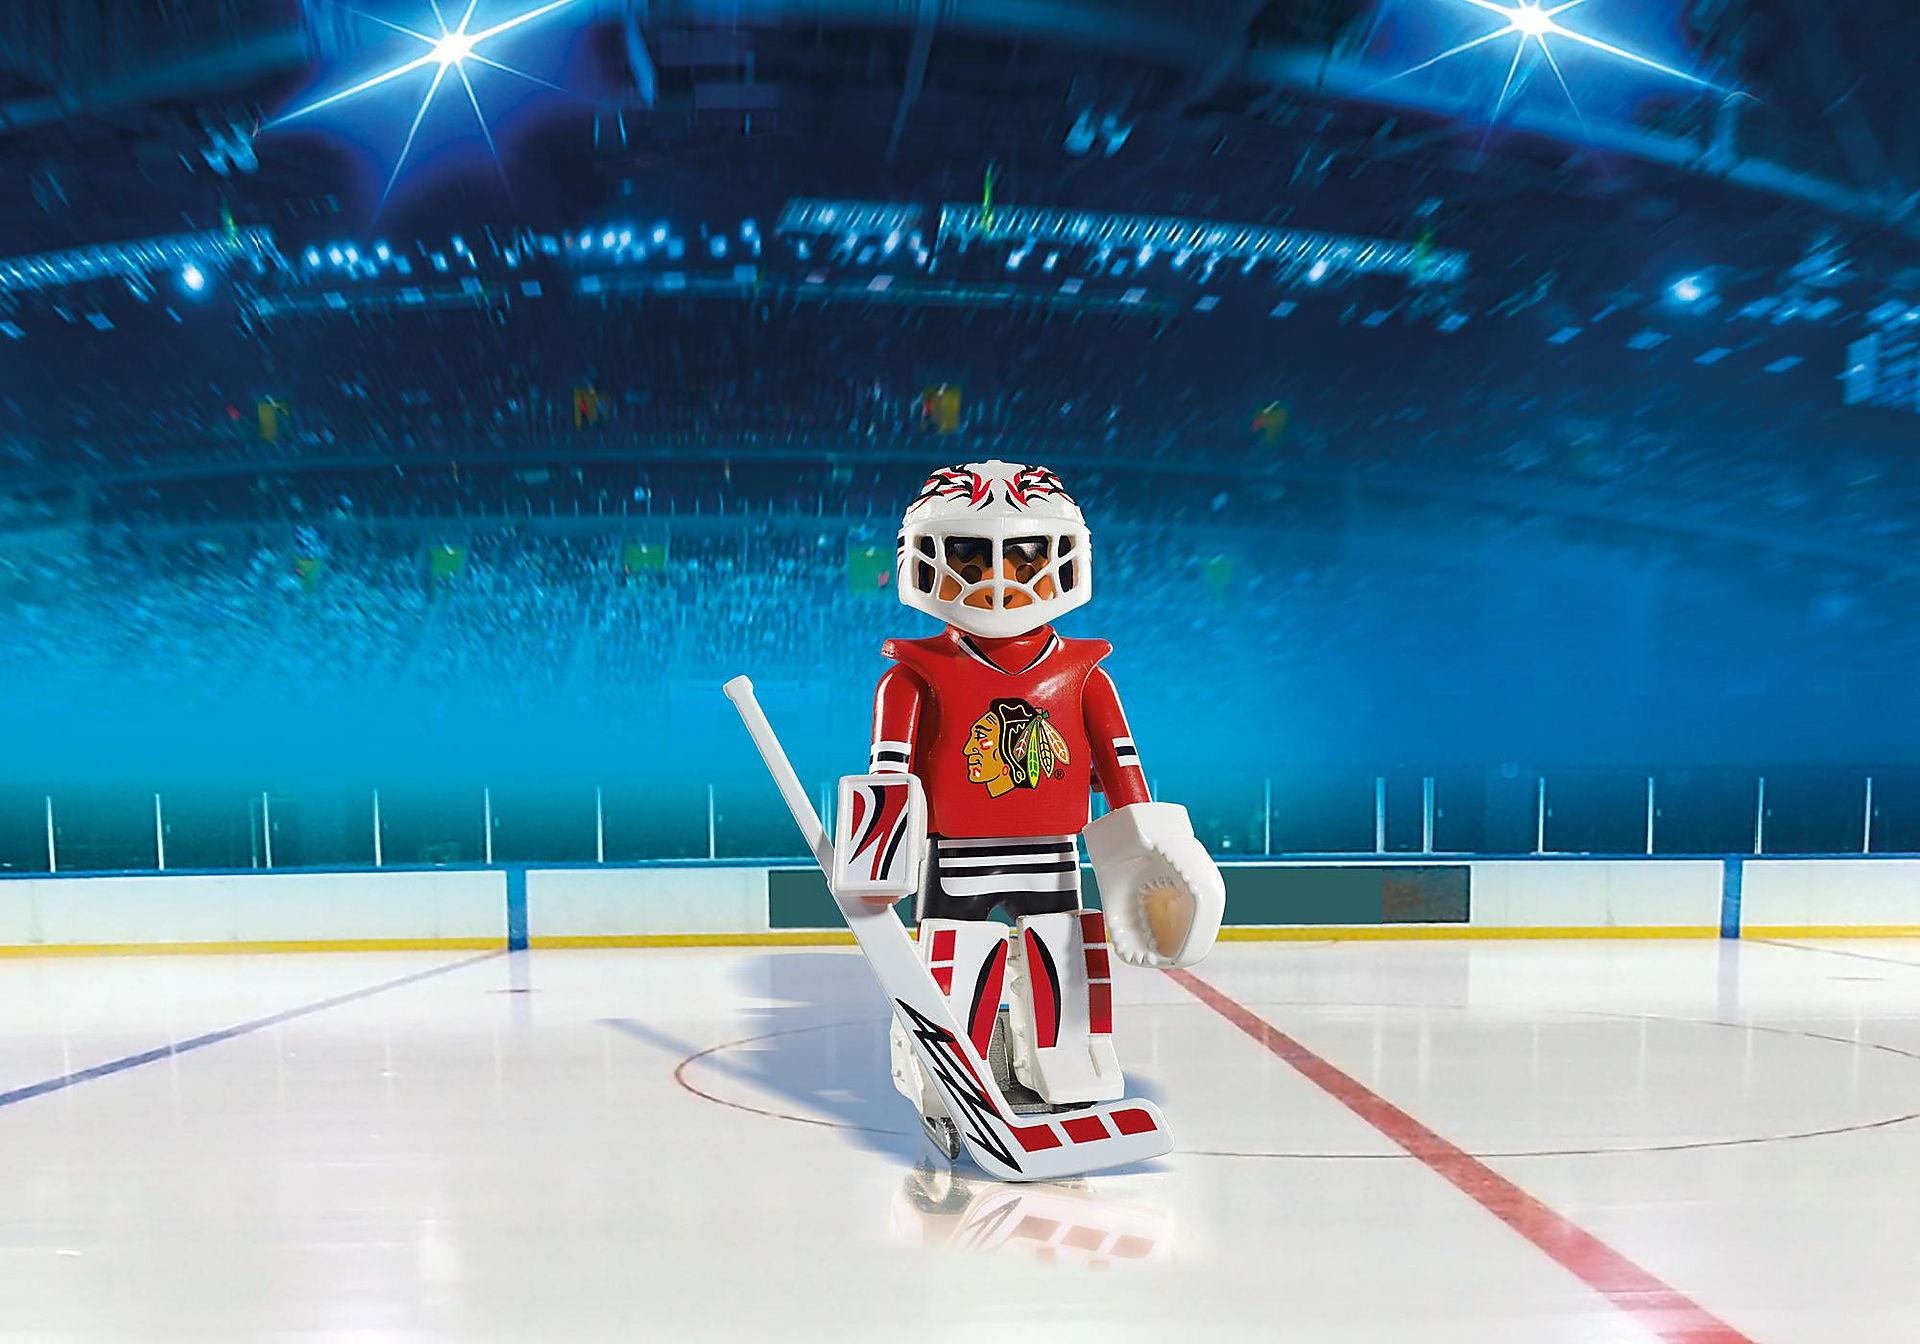 http://media.playmobil.com/i/playmobil/5074_product_detail/NHL™ Chicago Blackhawks™ Goalie